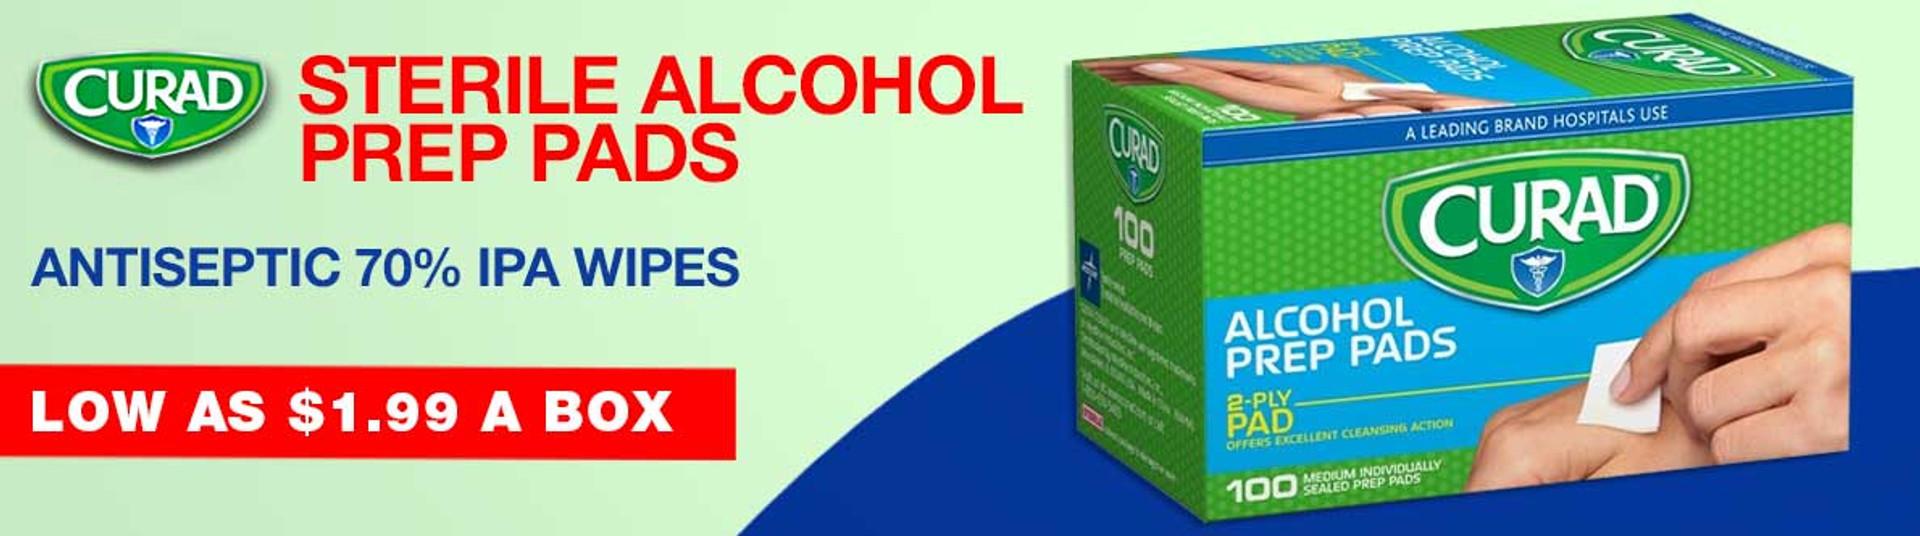 Curad Sterile Alcohol Prep Pads